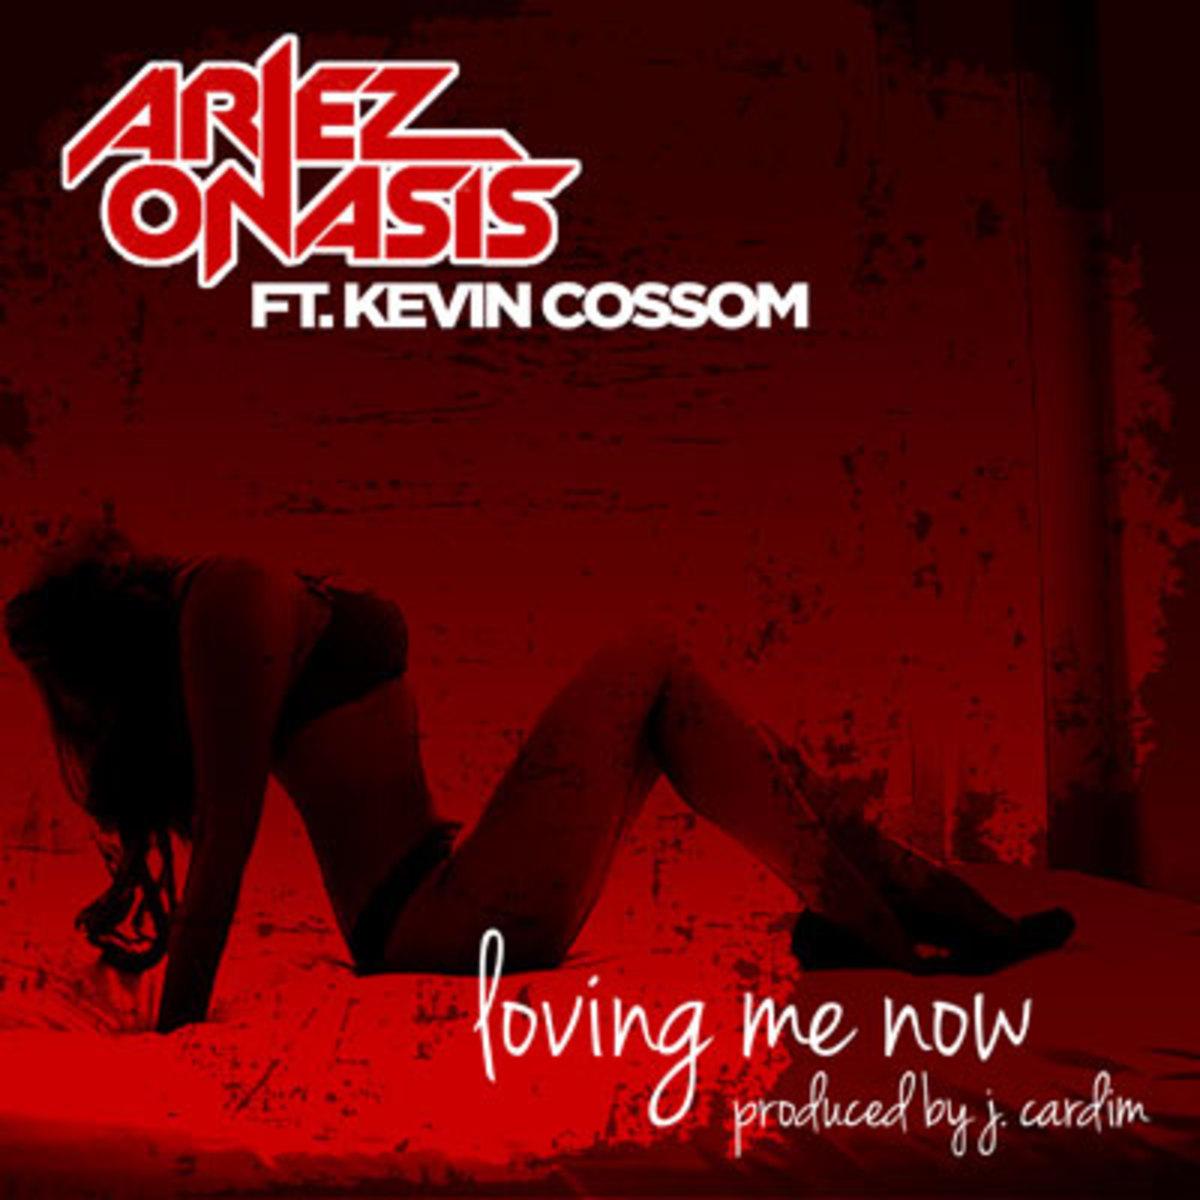 ariezonasis-lovingme.jpg